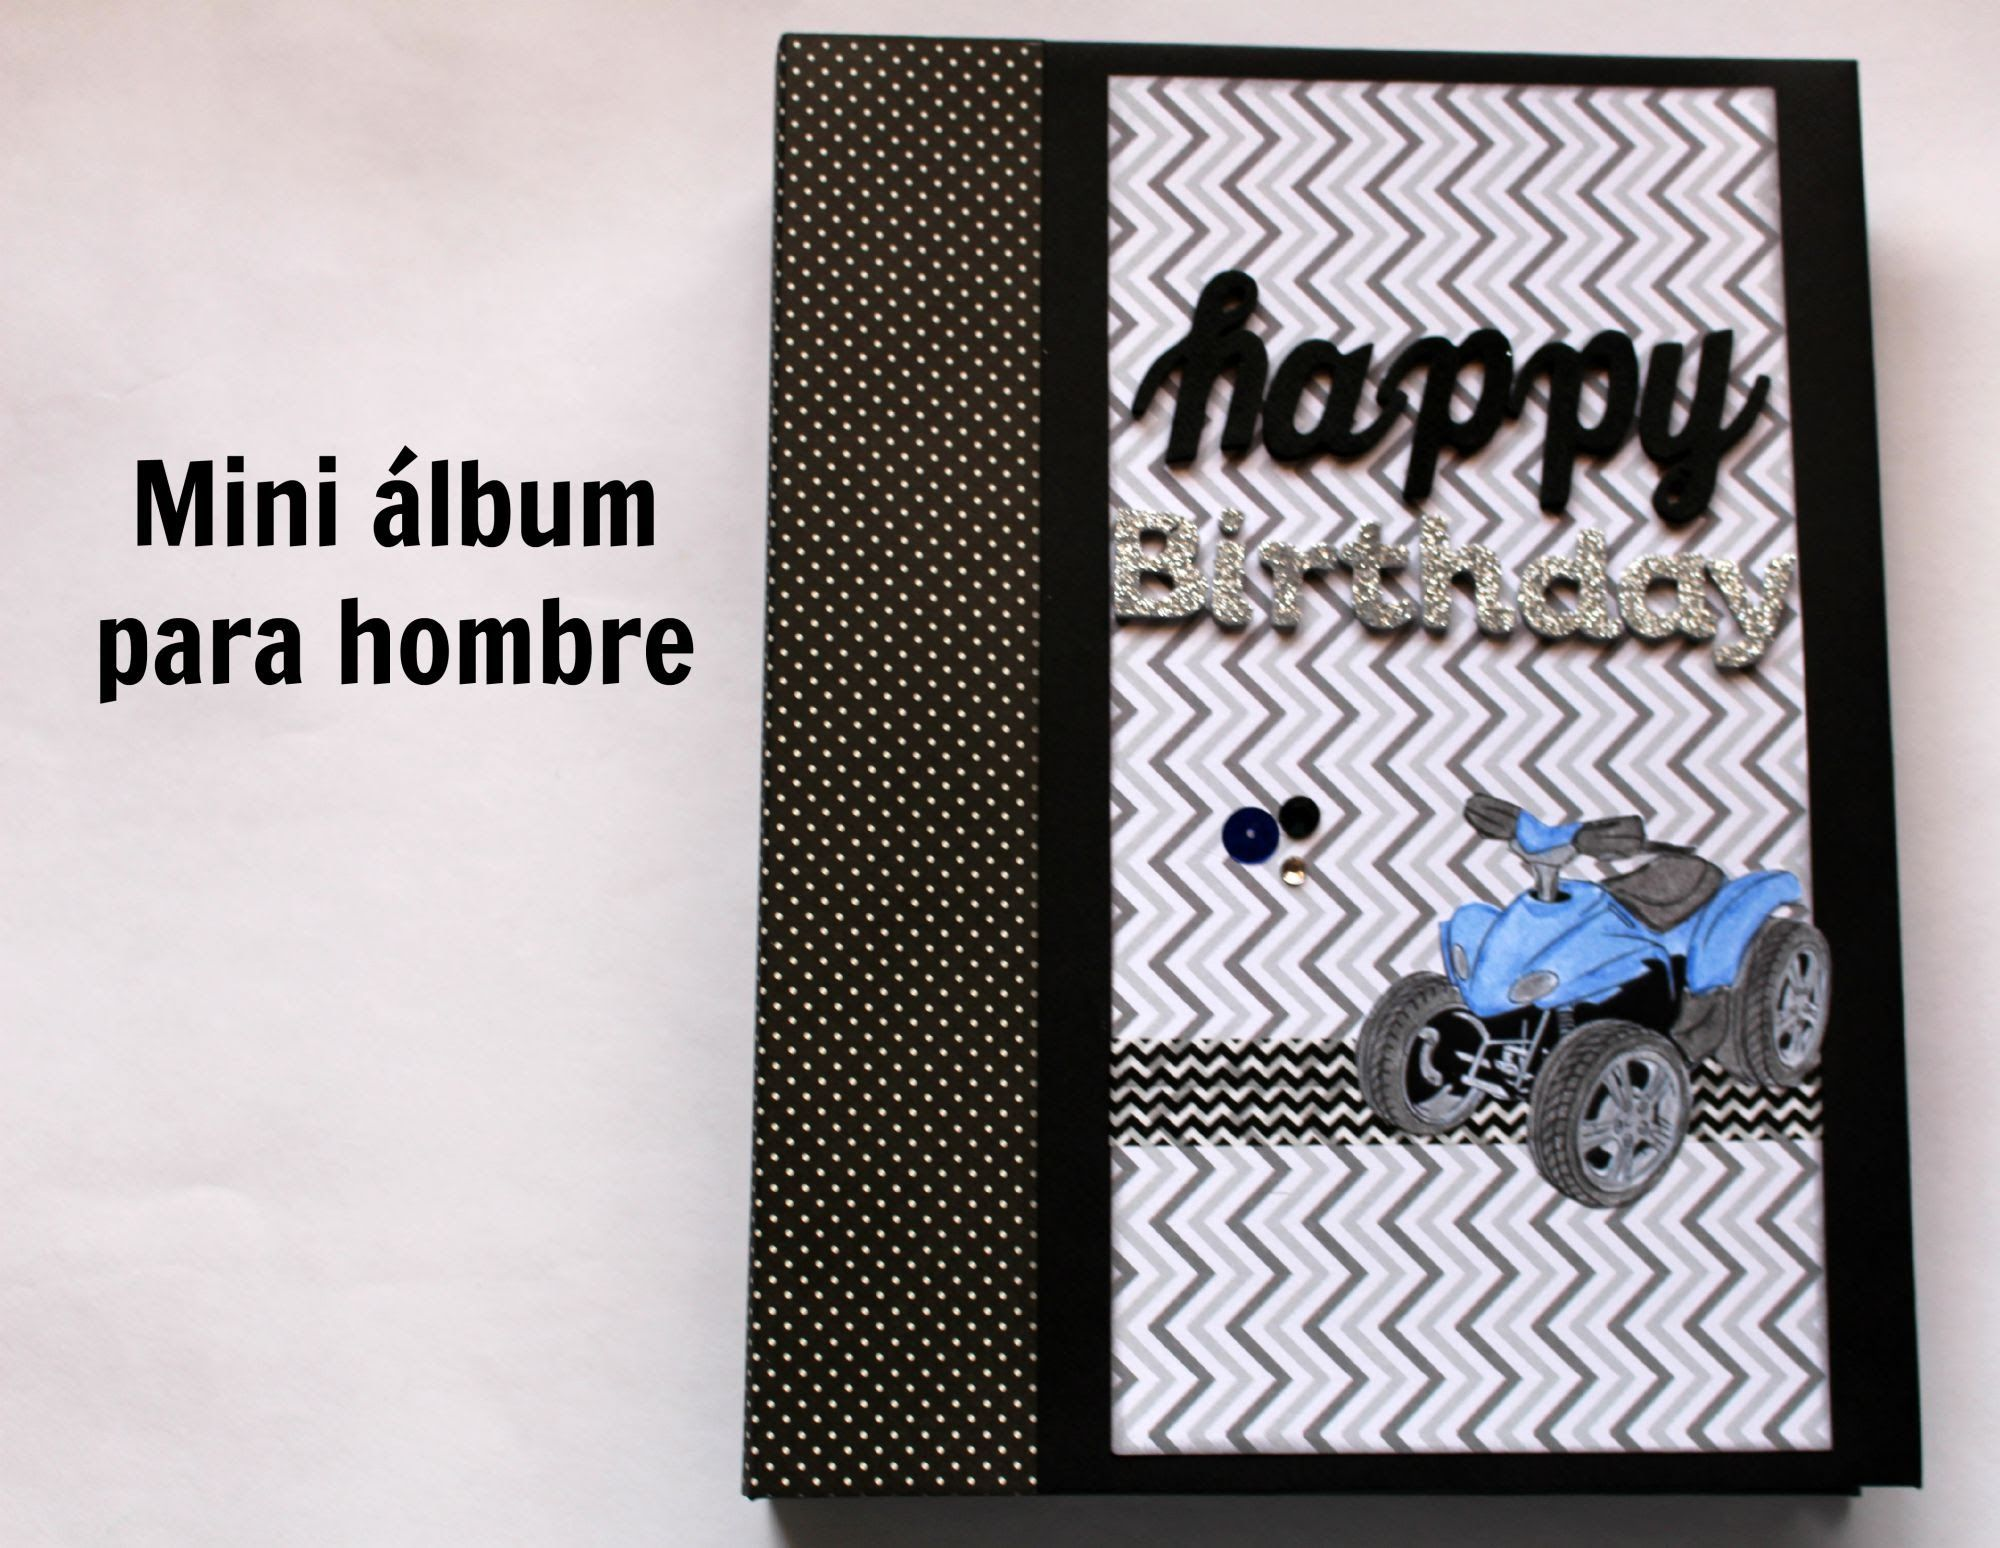 Diy mini album scrapbook for boyfriend 2014 youtube - Mini Lbum Scrapbook Para Hombre Creaciones Izzy